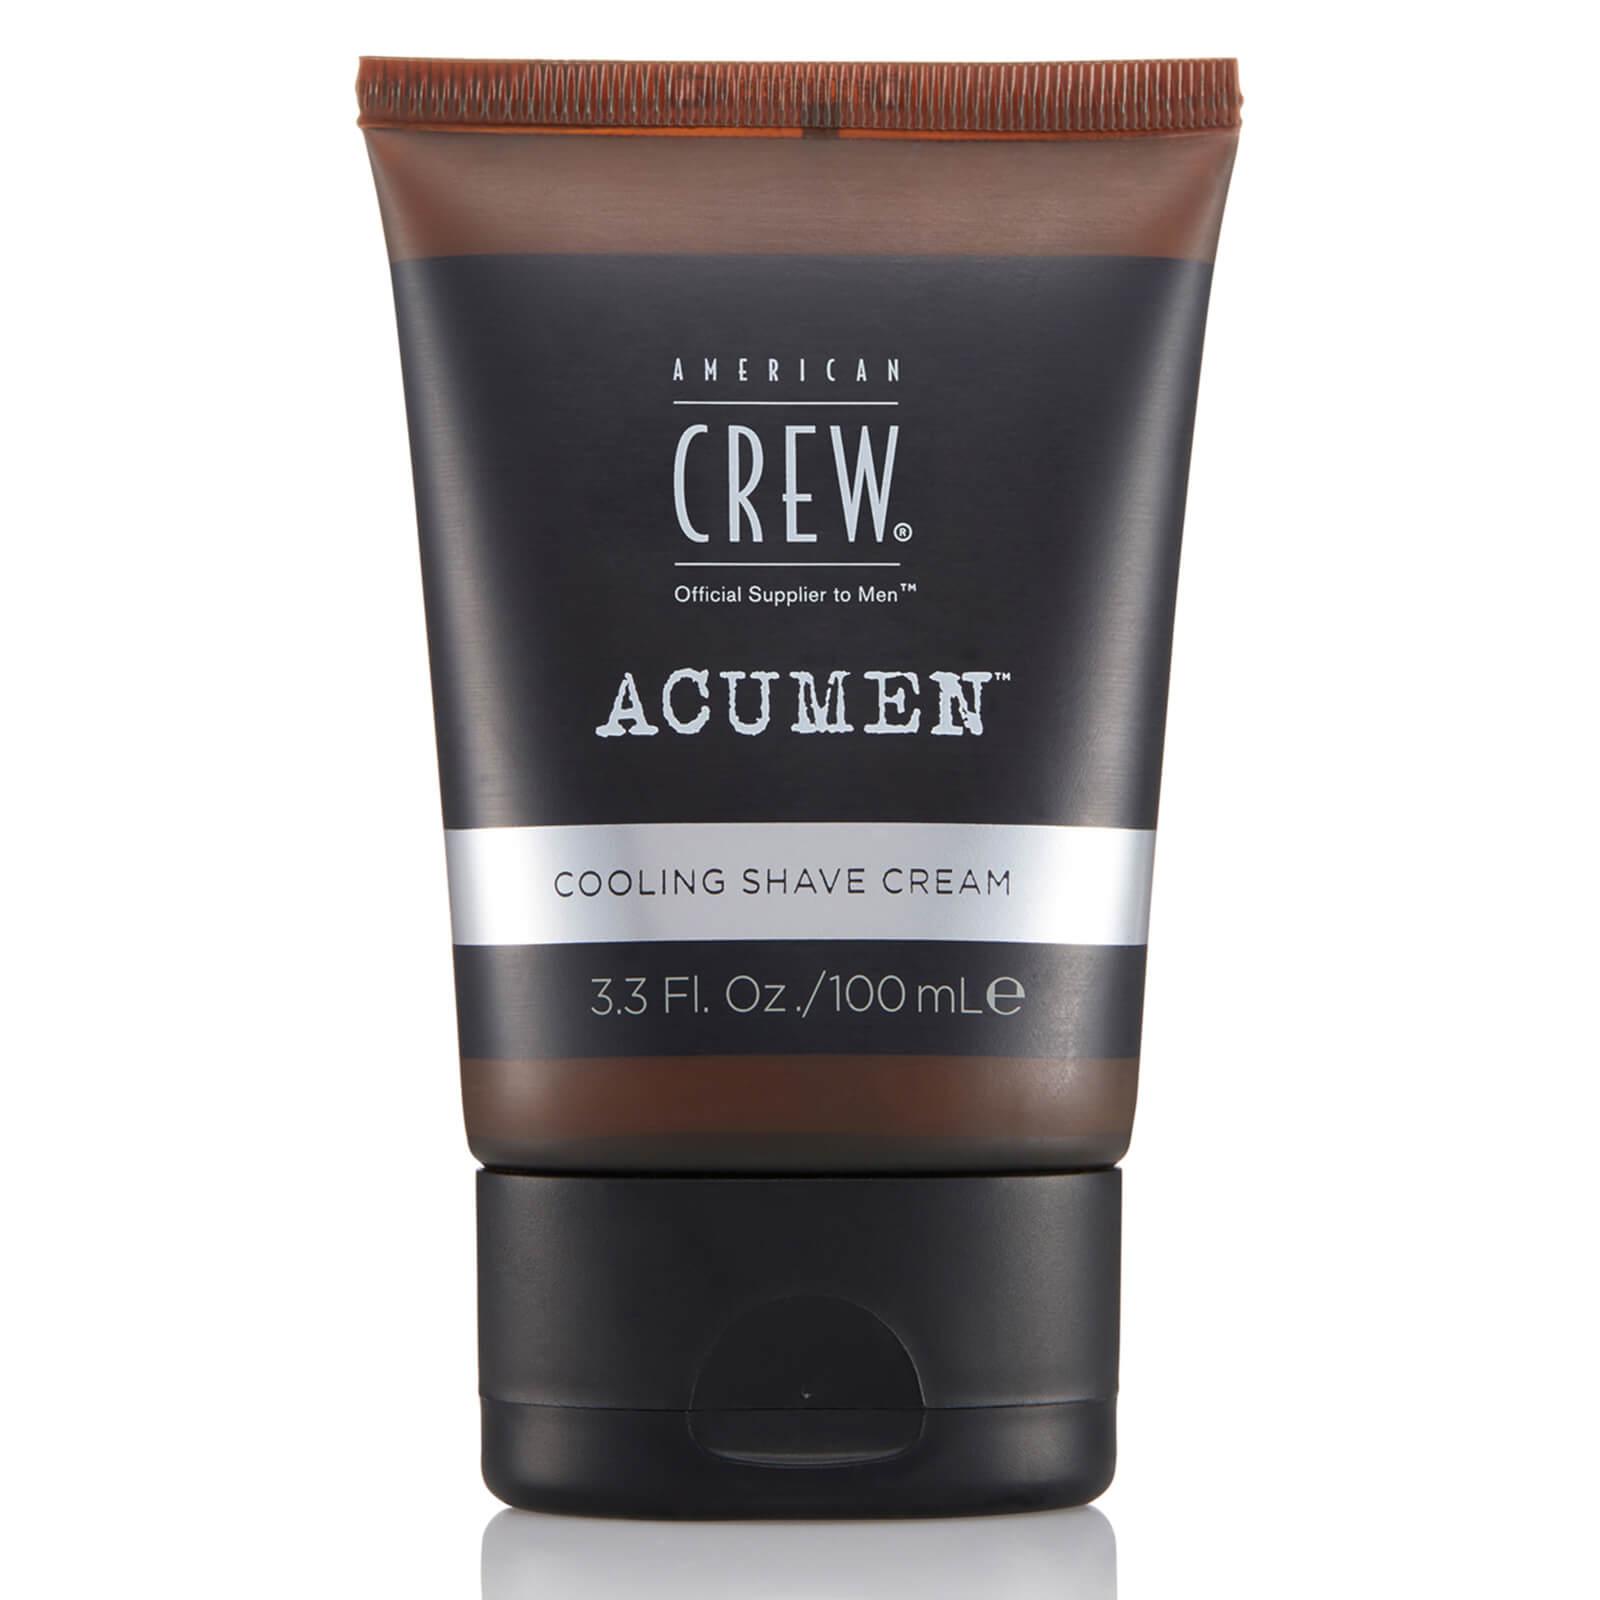 American Crew Cooling Shave Cream 100ml